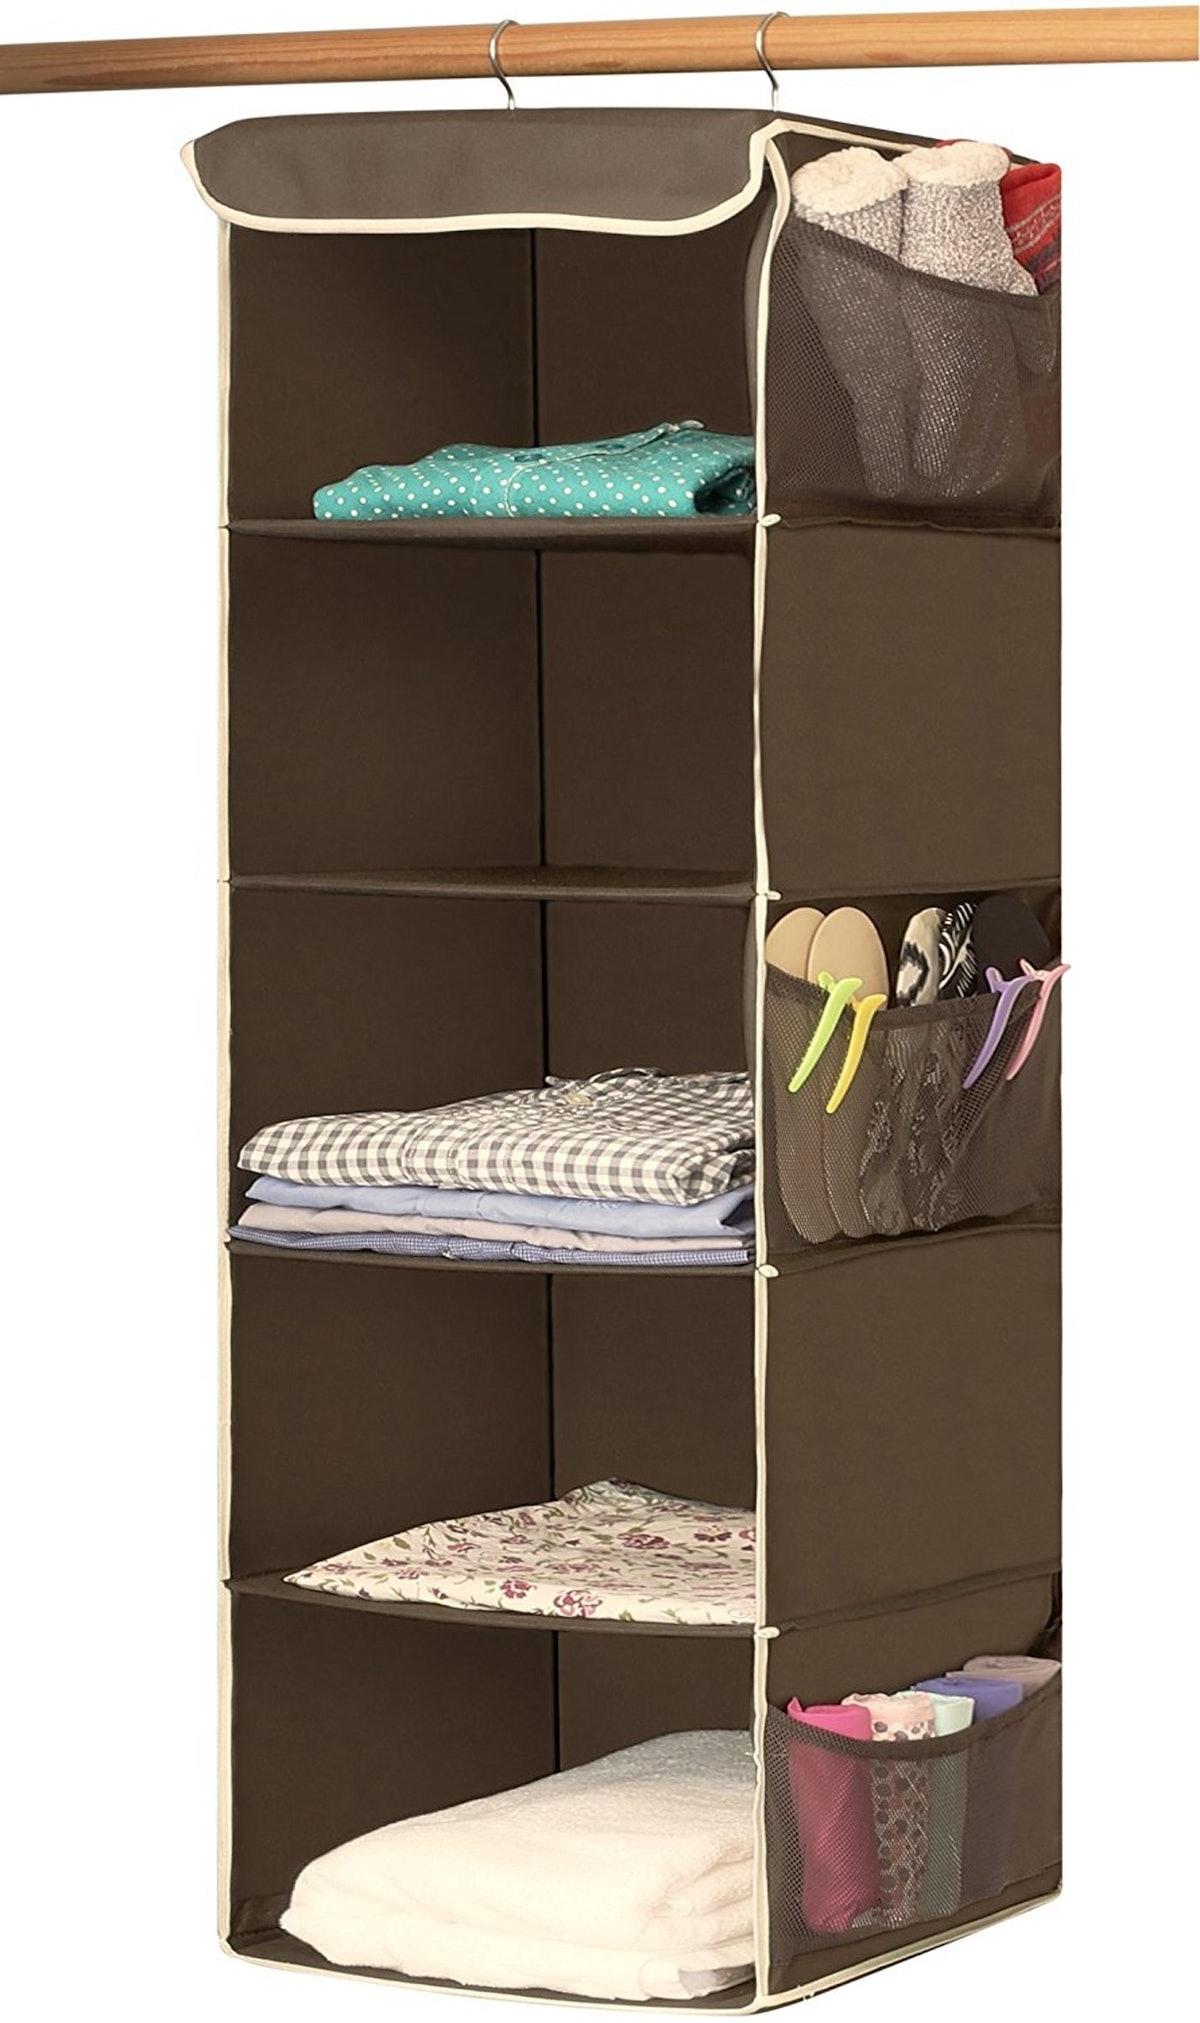 SimpleHouseware Hanging Closet Organizer